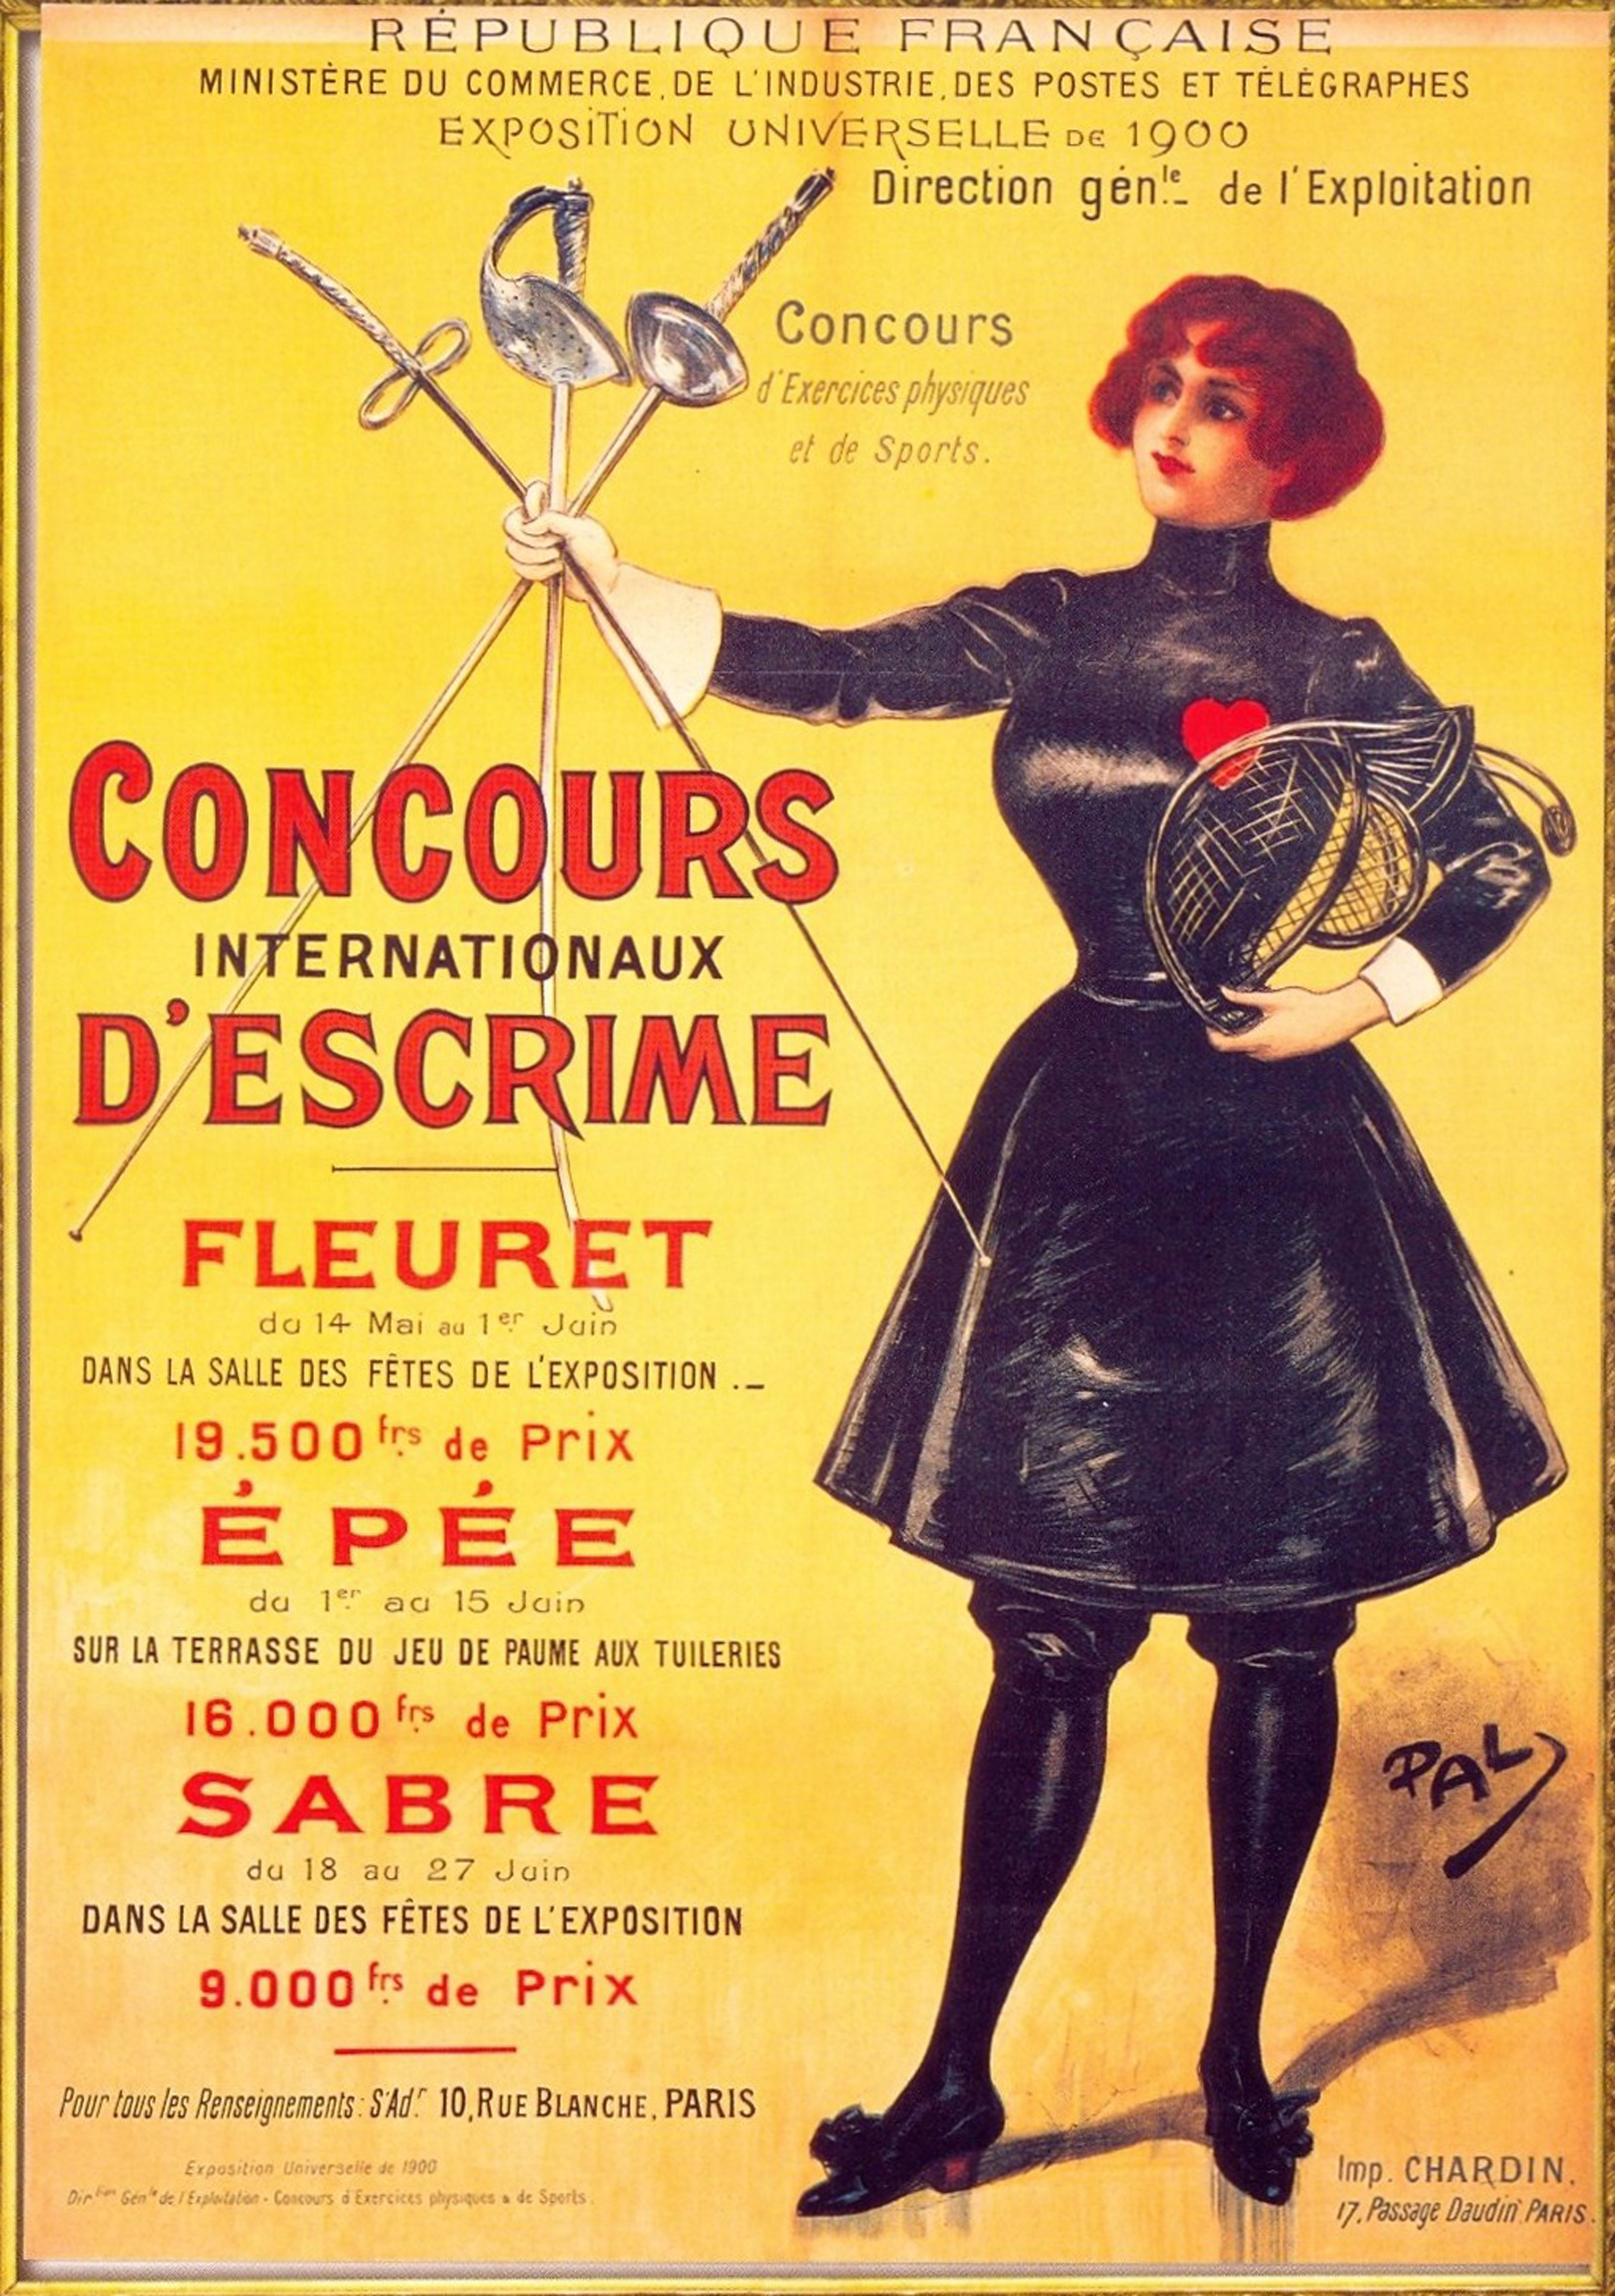 1900 Olympics poster